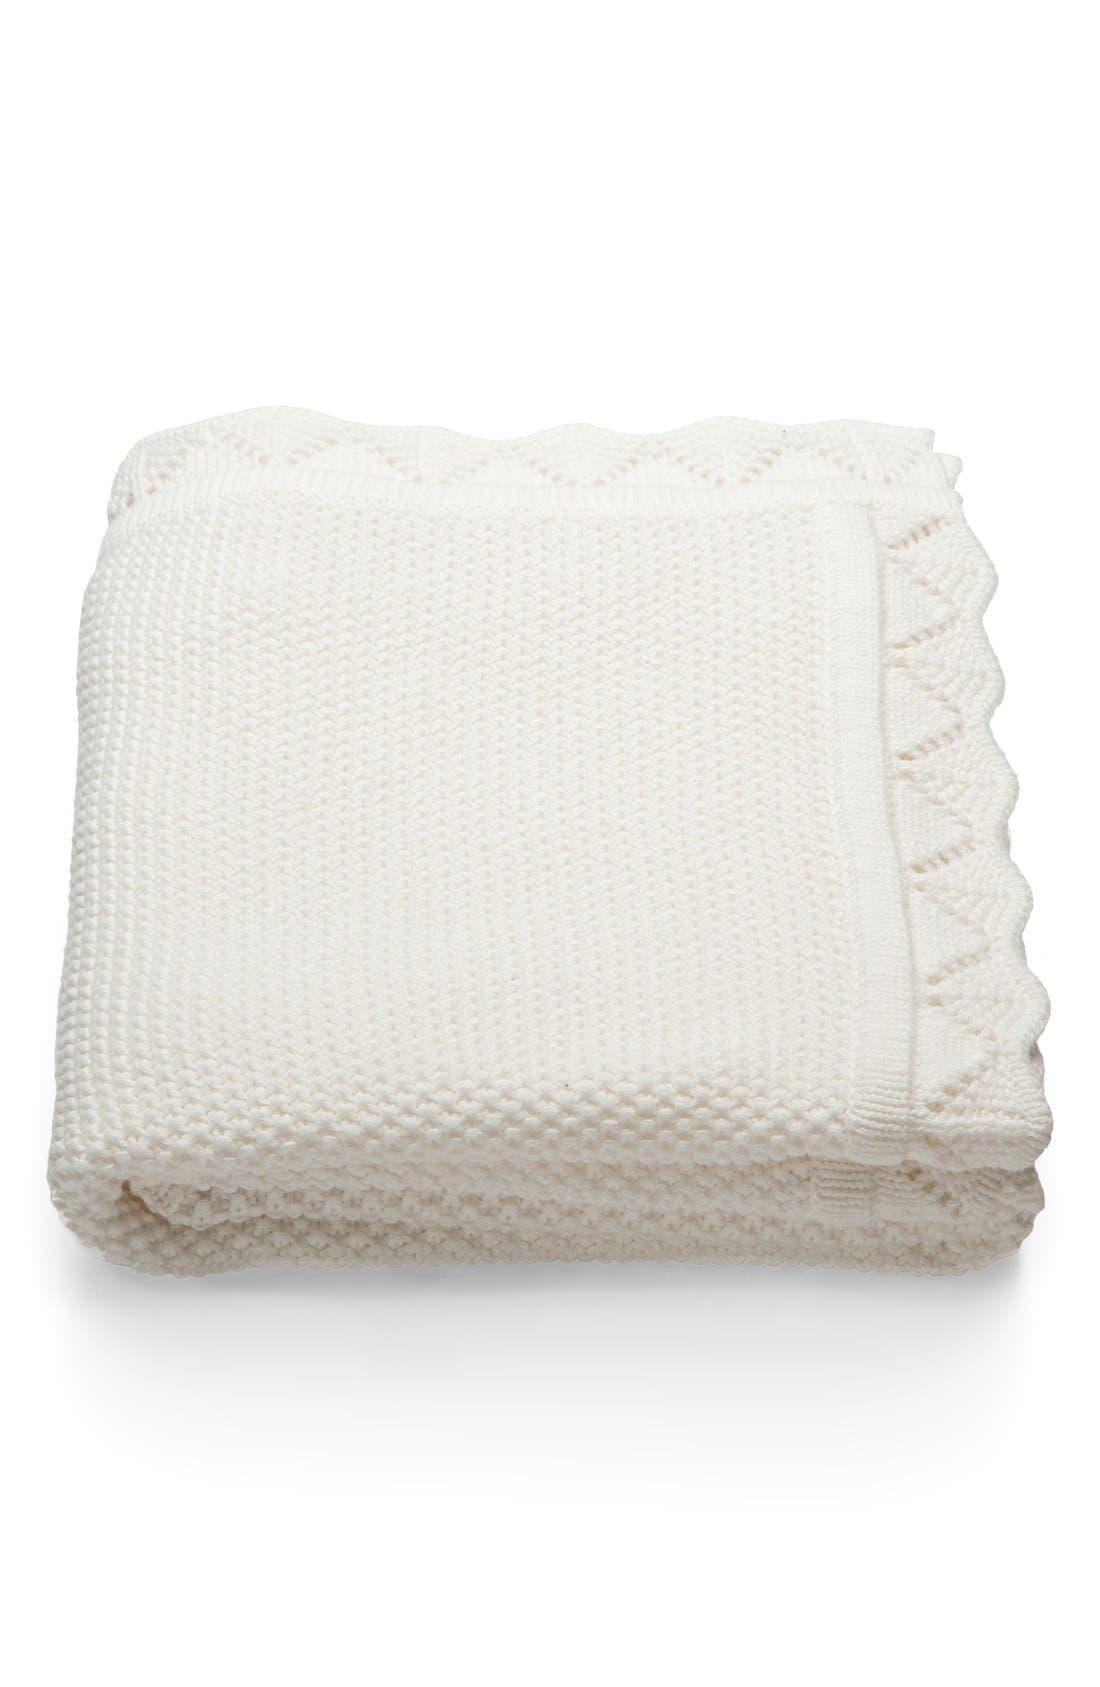 Alternate Image 1 Selected - Stokke 'Classic' Baby Blanket